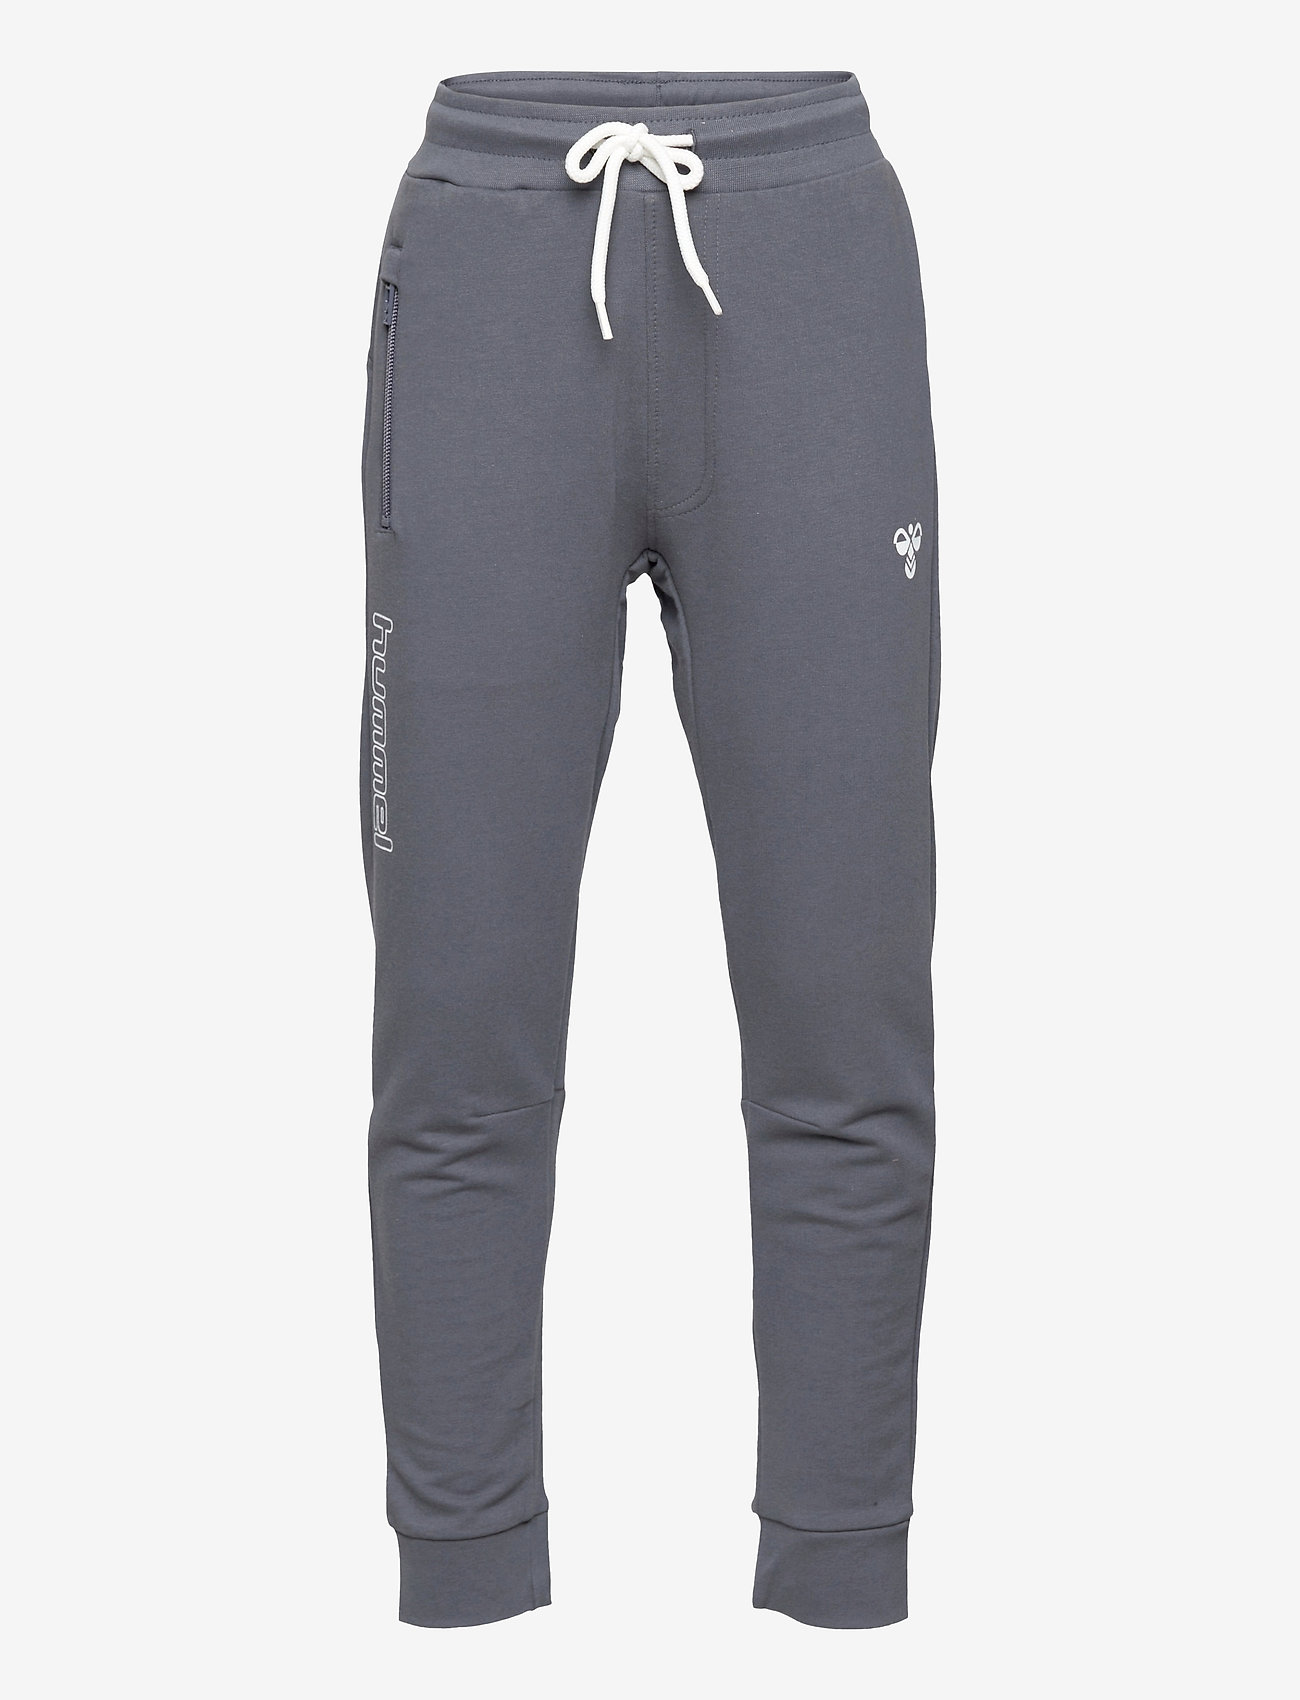 Hummel - hmlOCHO PANTS - sweatpants - ombre blue - 0